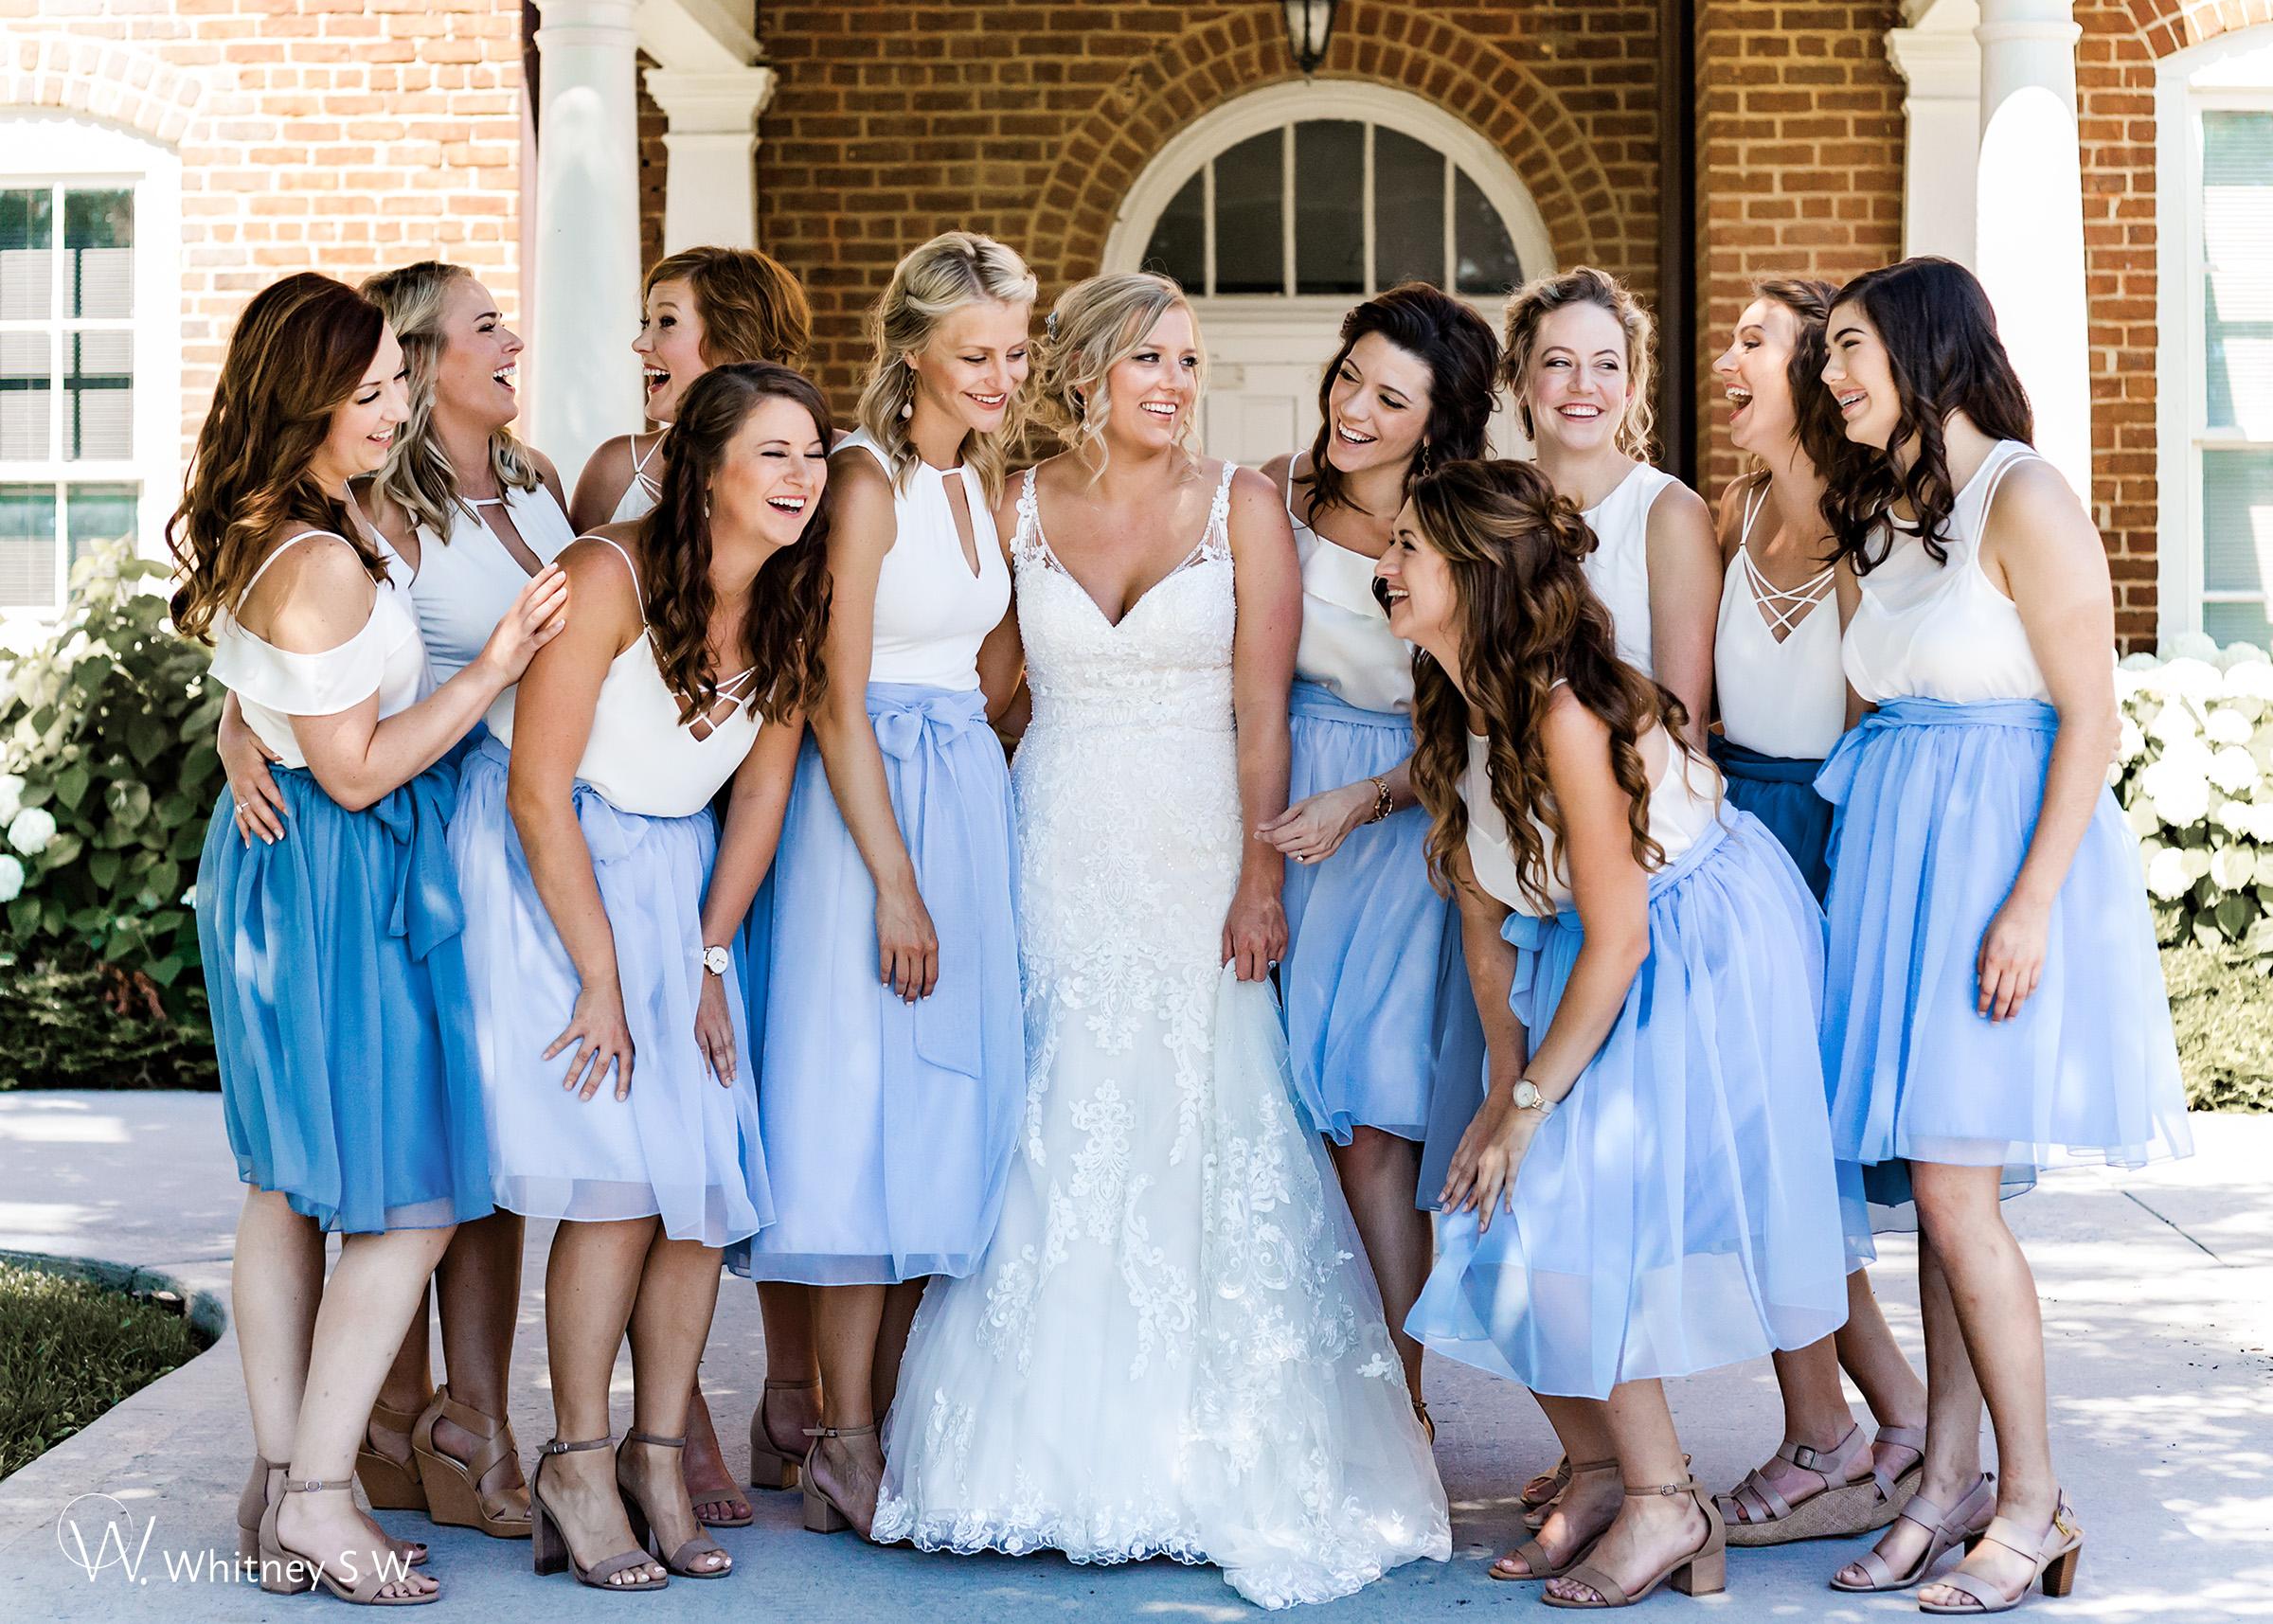 Morgan & Kaivon Wedding - Photography by Whitney S Williams whitneysw (36).jpg